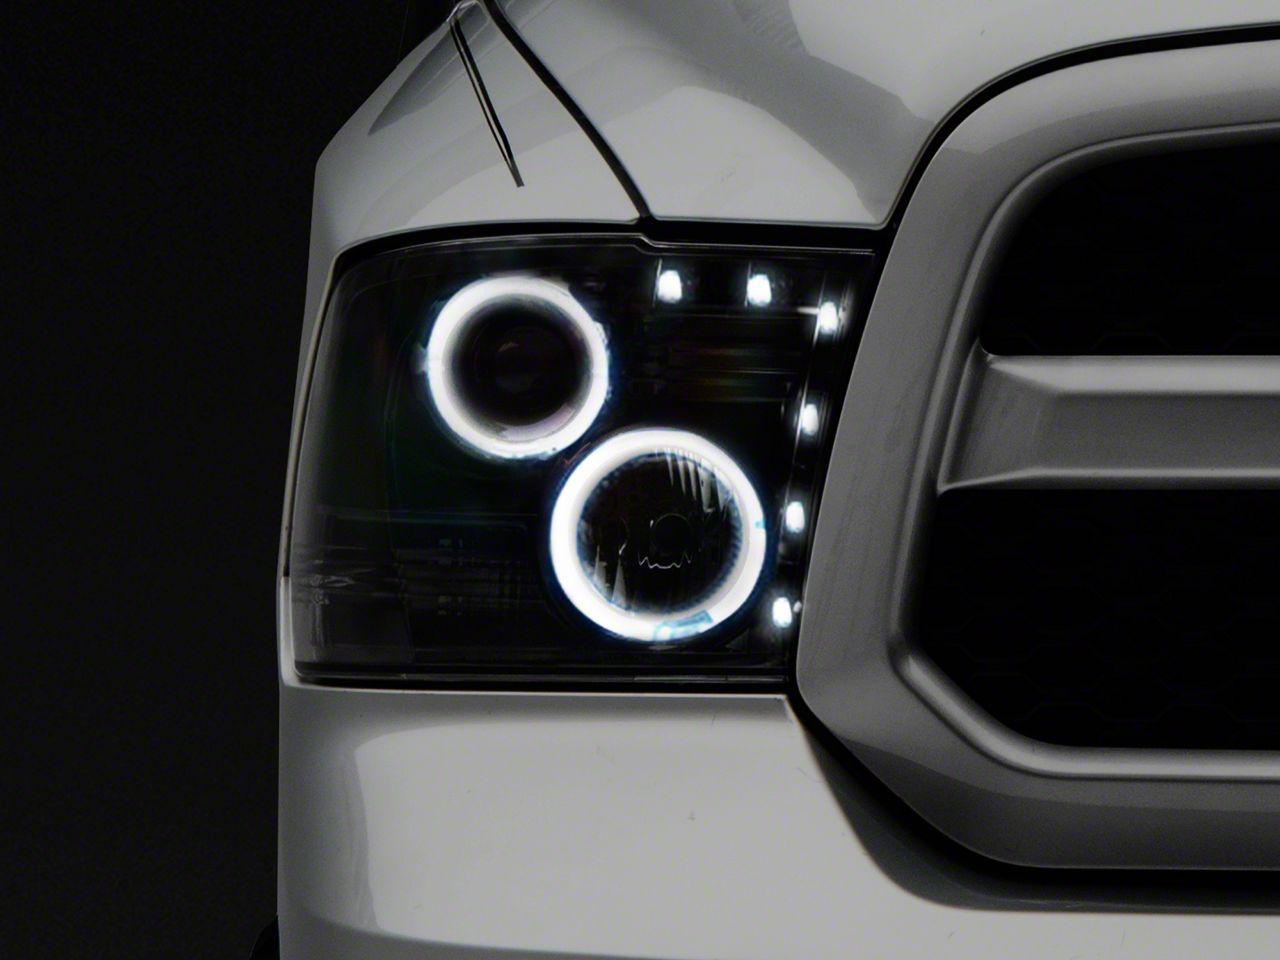 Recon Smoked / Black Projector Headlights w/ CCFL Halos & Daytime Running Lights (09-18 RAM 1500 w/o Projector Headlights)